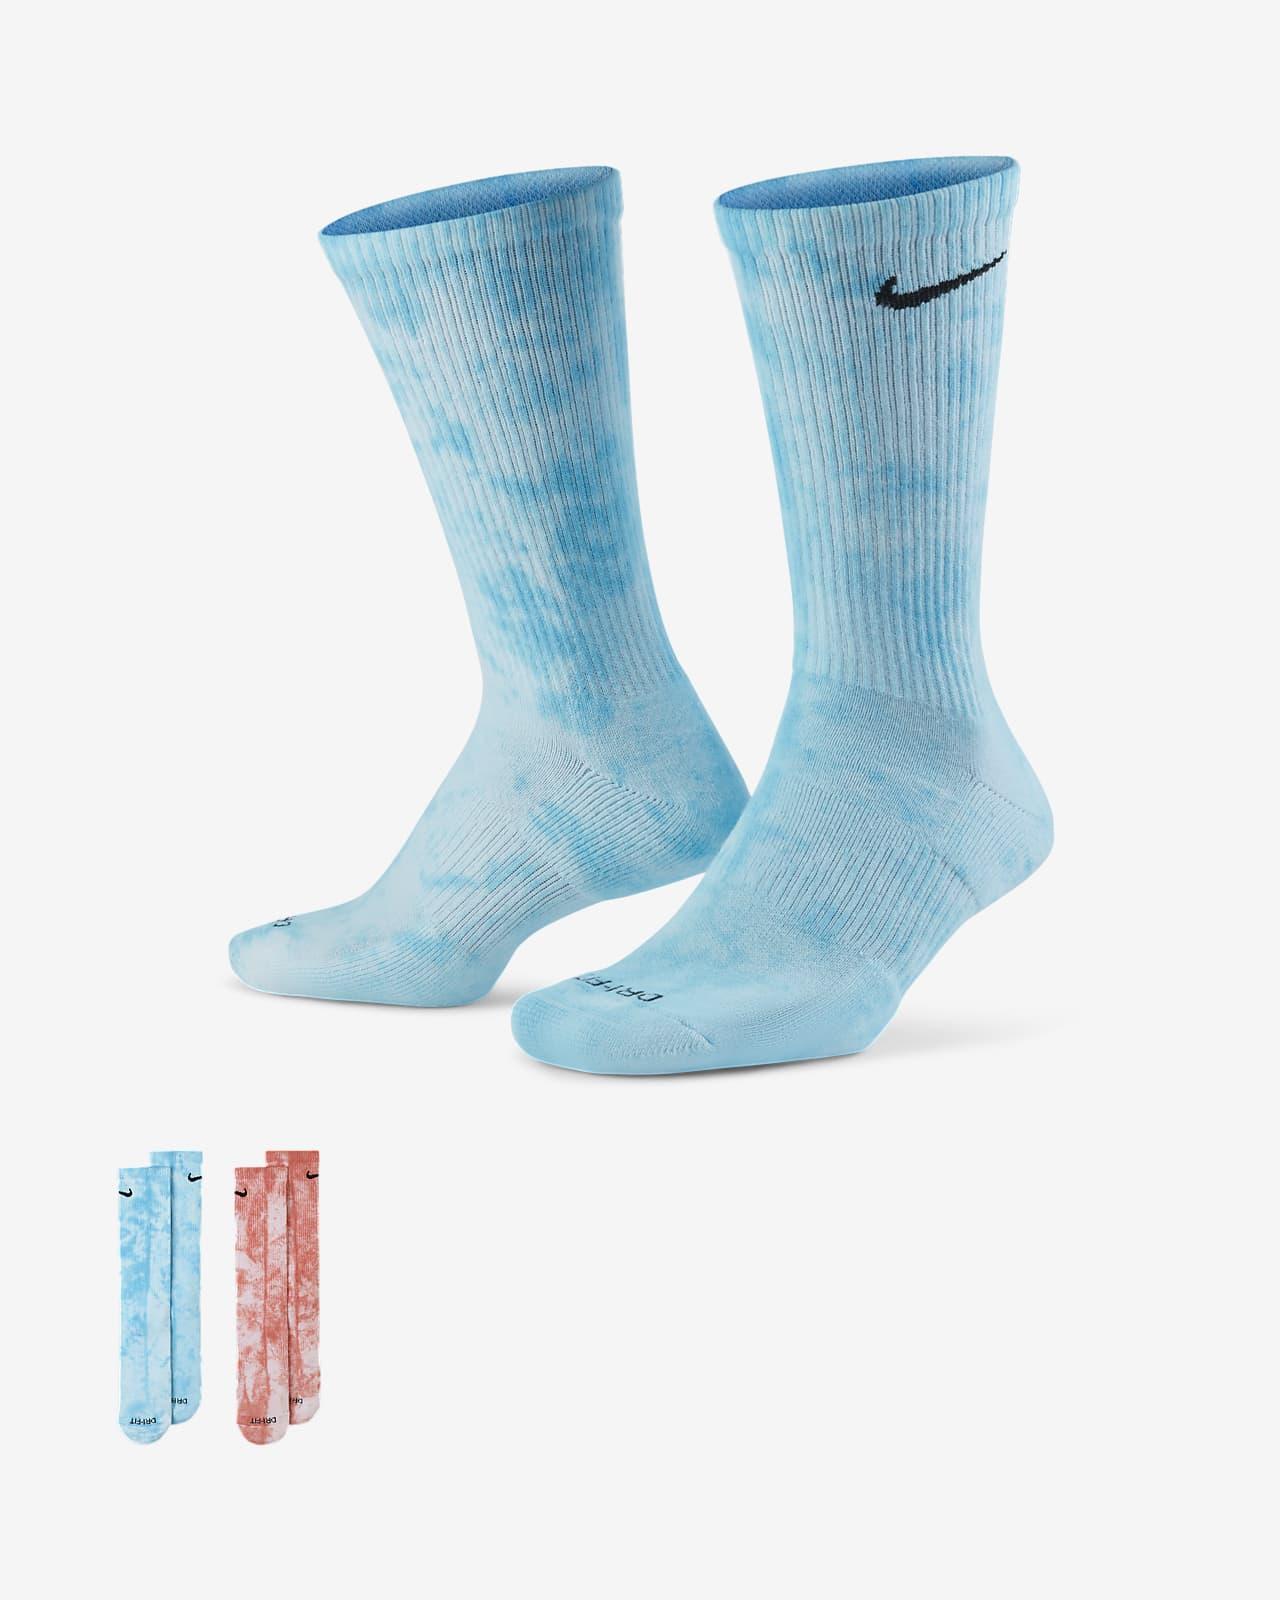 Calcetines largos de teñido batik Nike Everyday Plus Cushioned (2 pares)